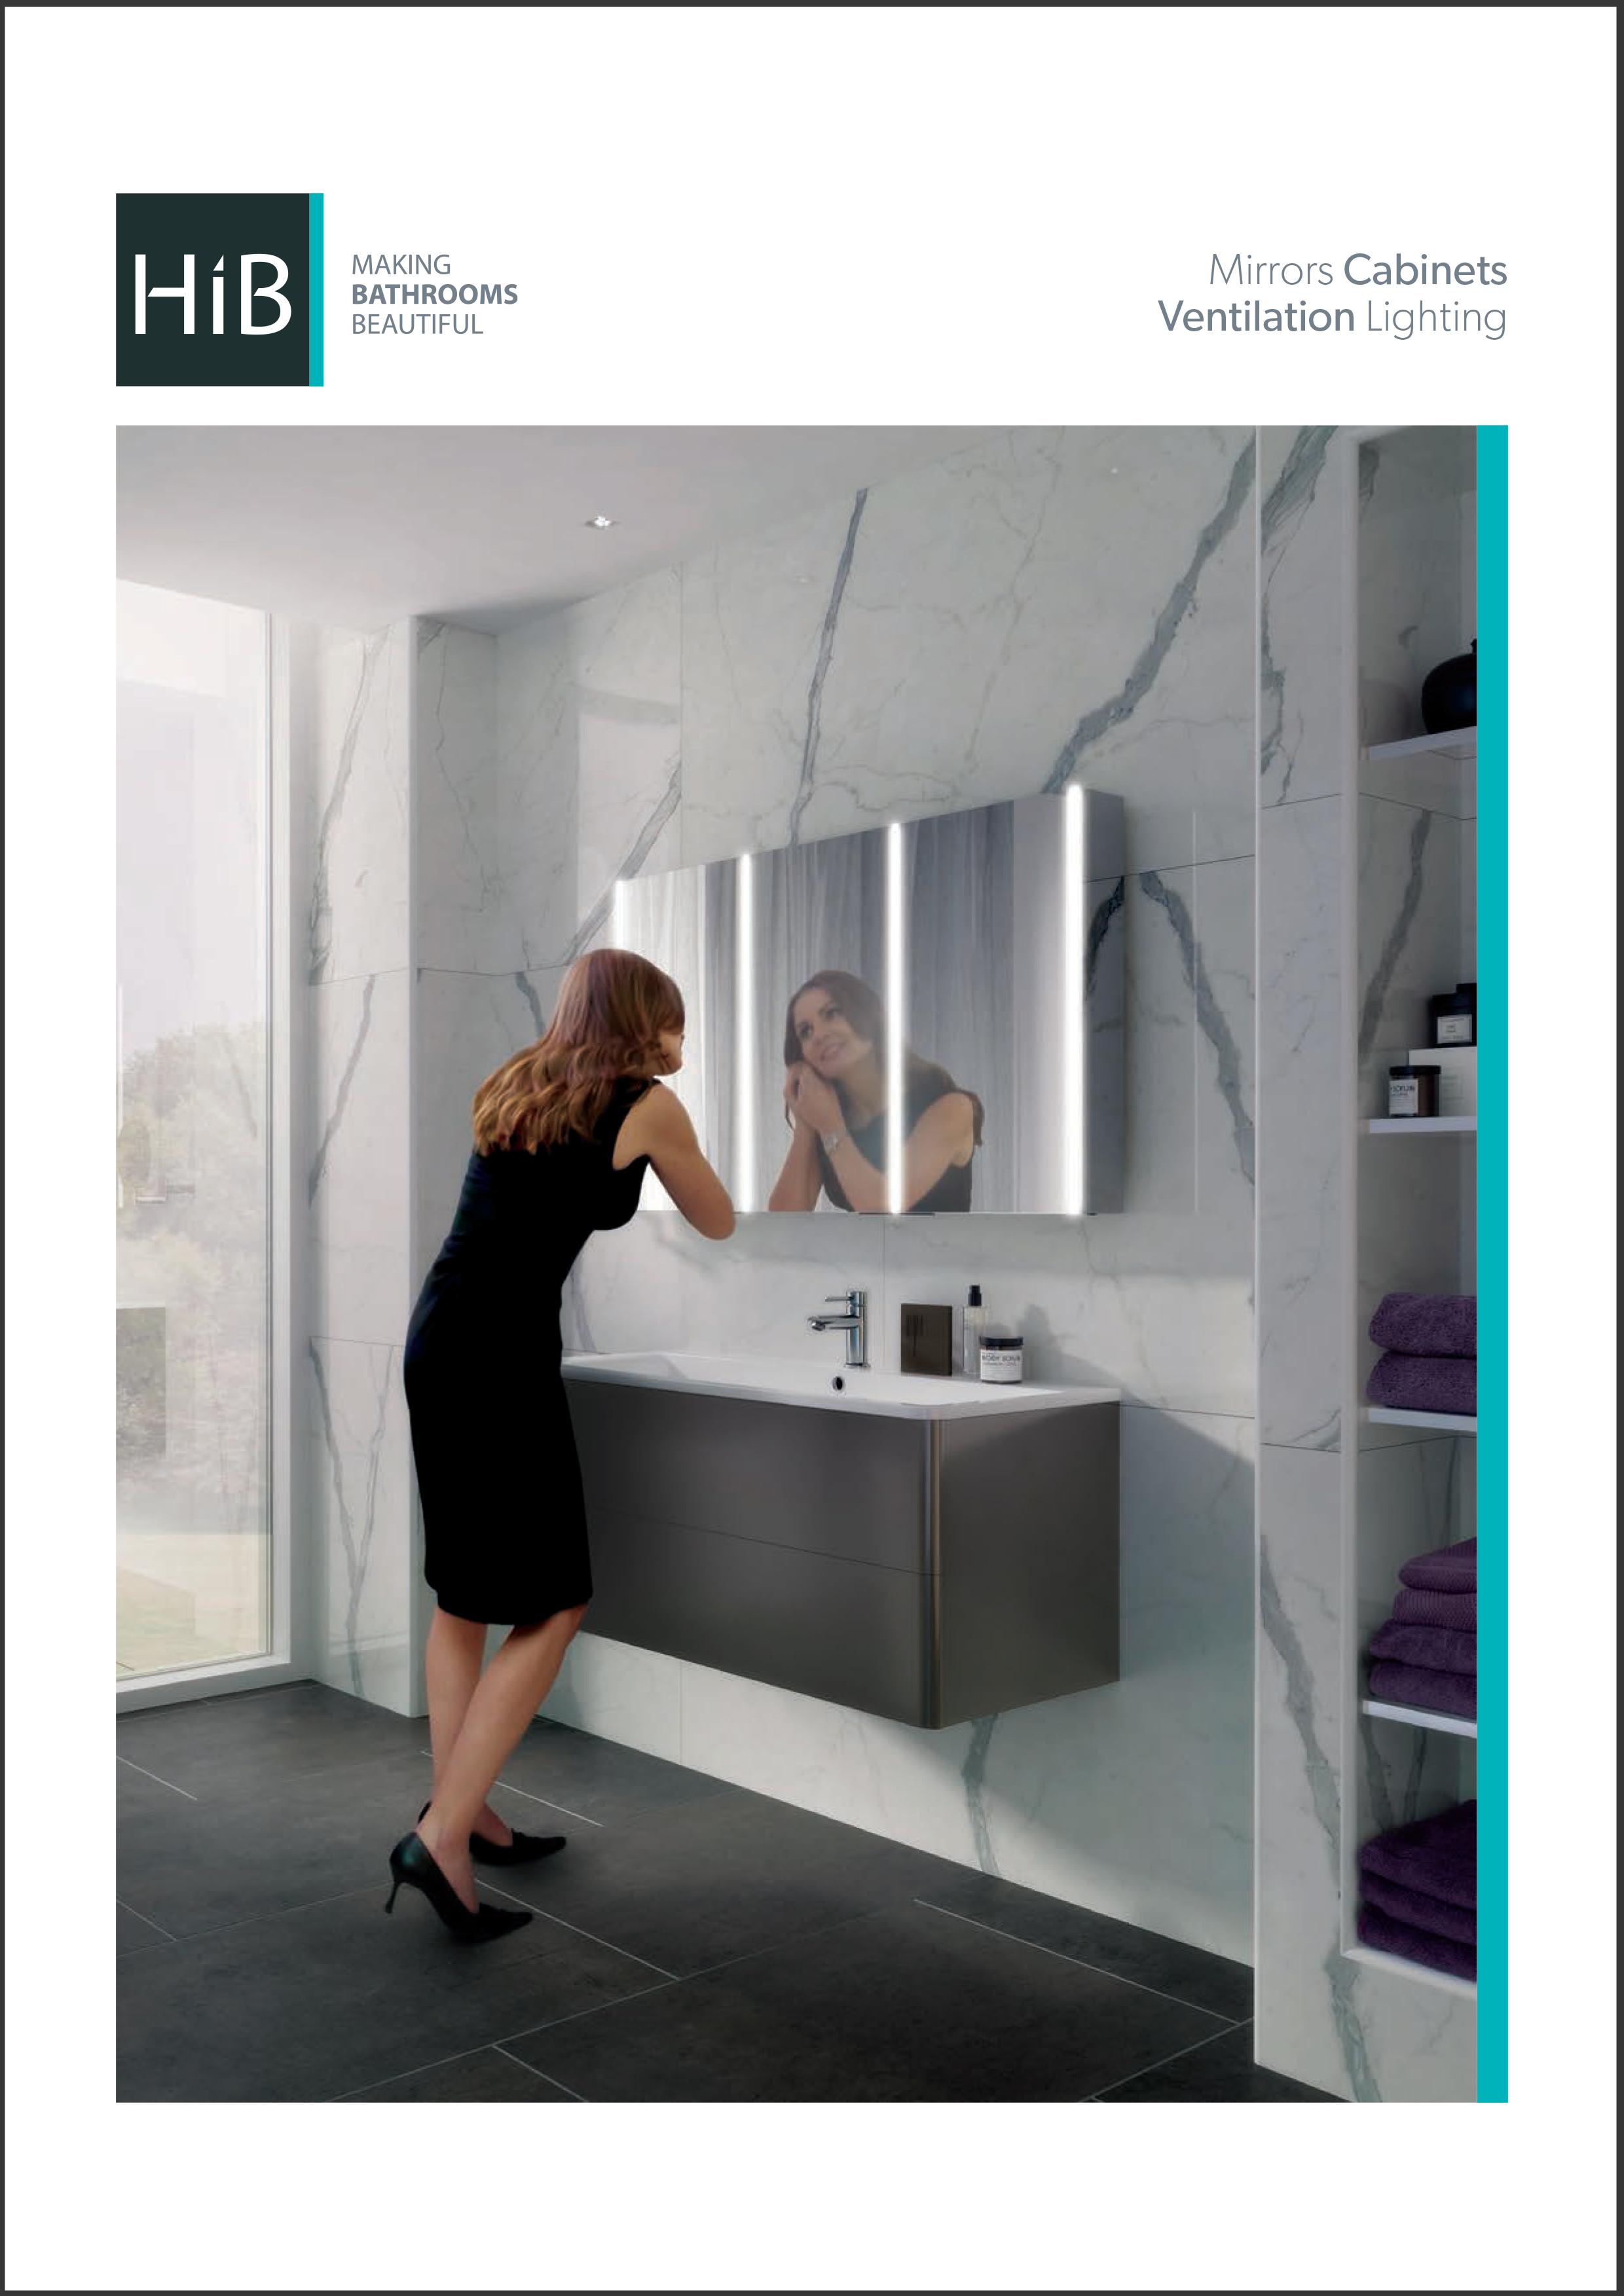 HIB BATHROOMS COLLECTION